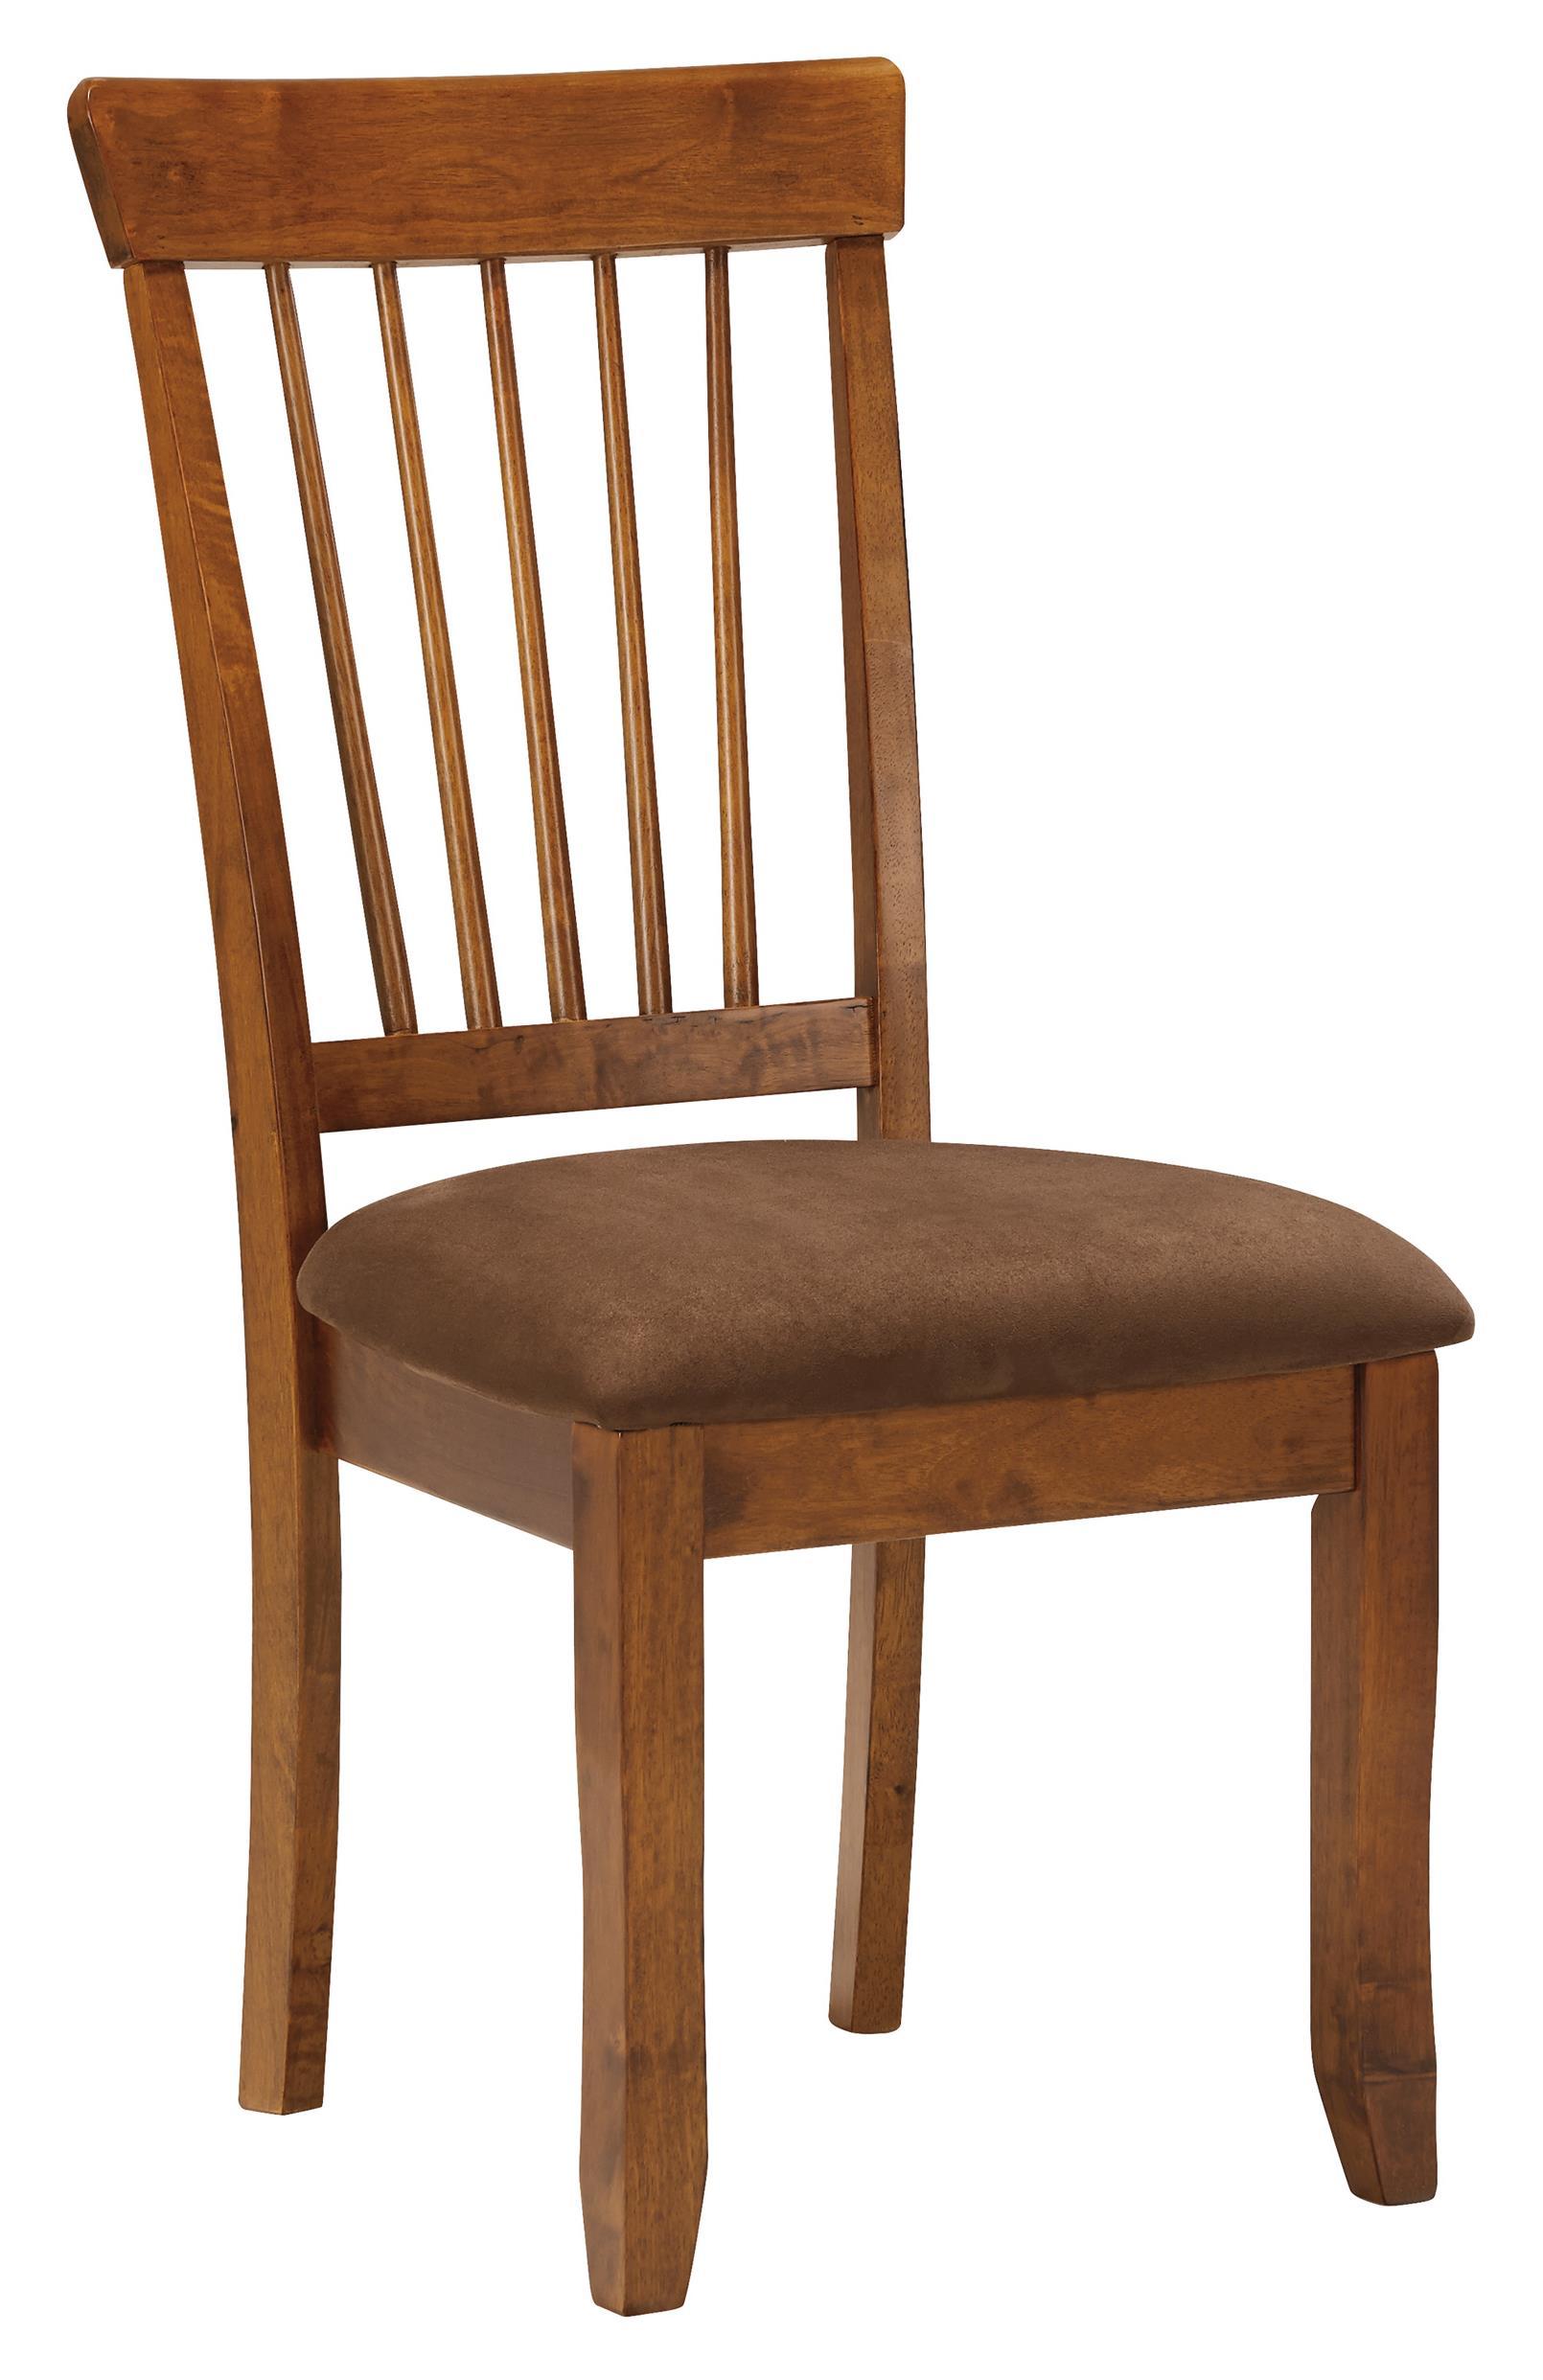 Ashley Furniture Berringer 5 Piece 36x60 Table & Chair Set